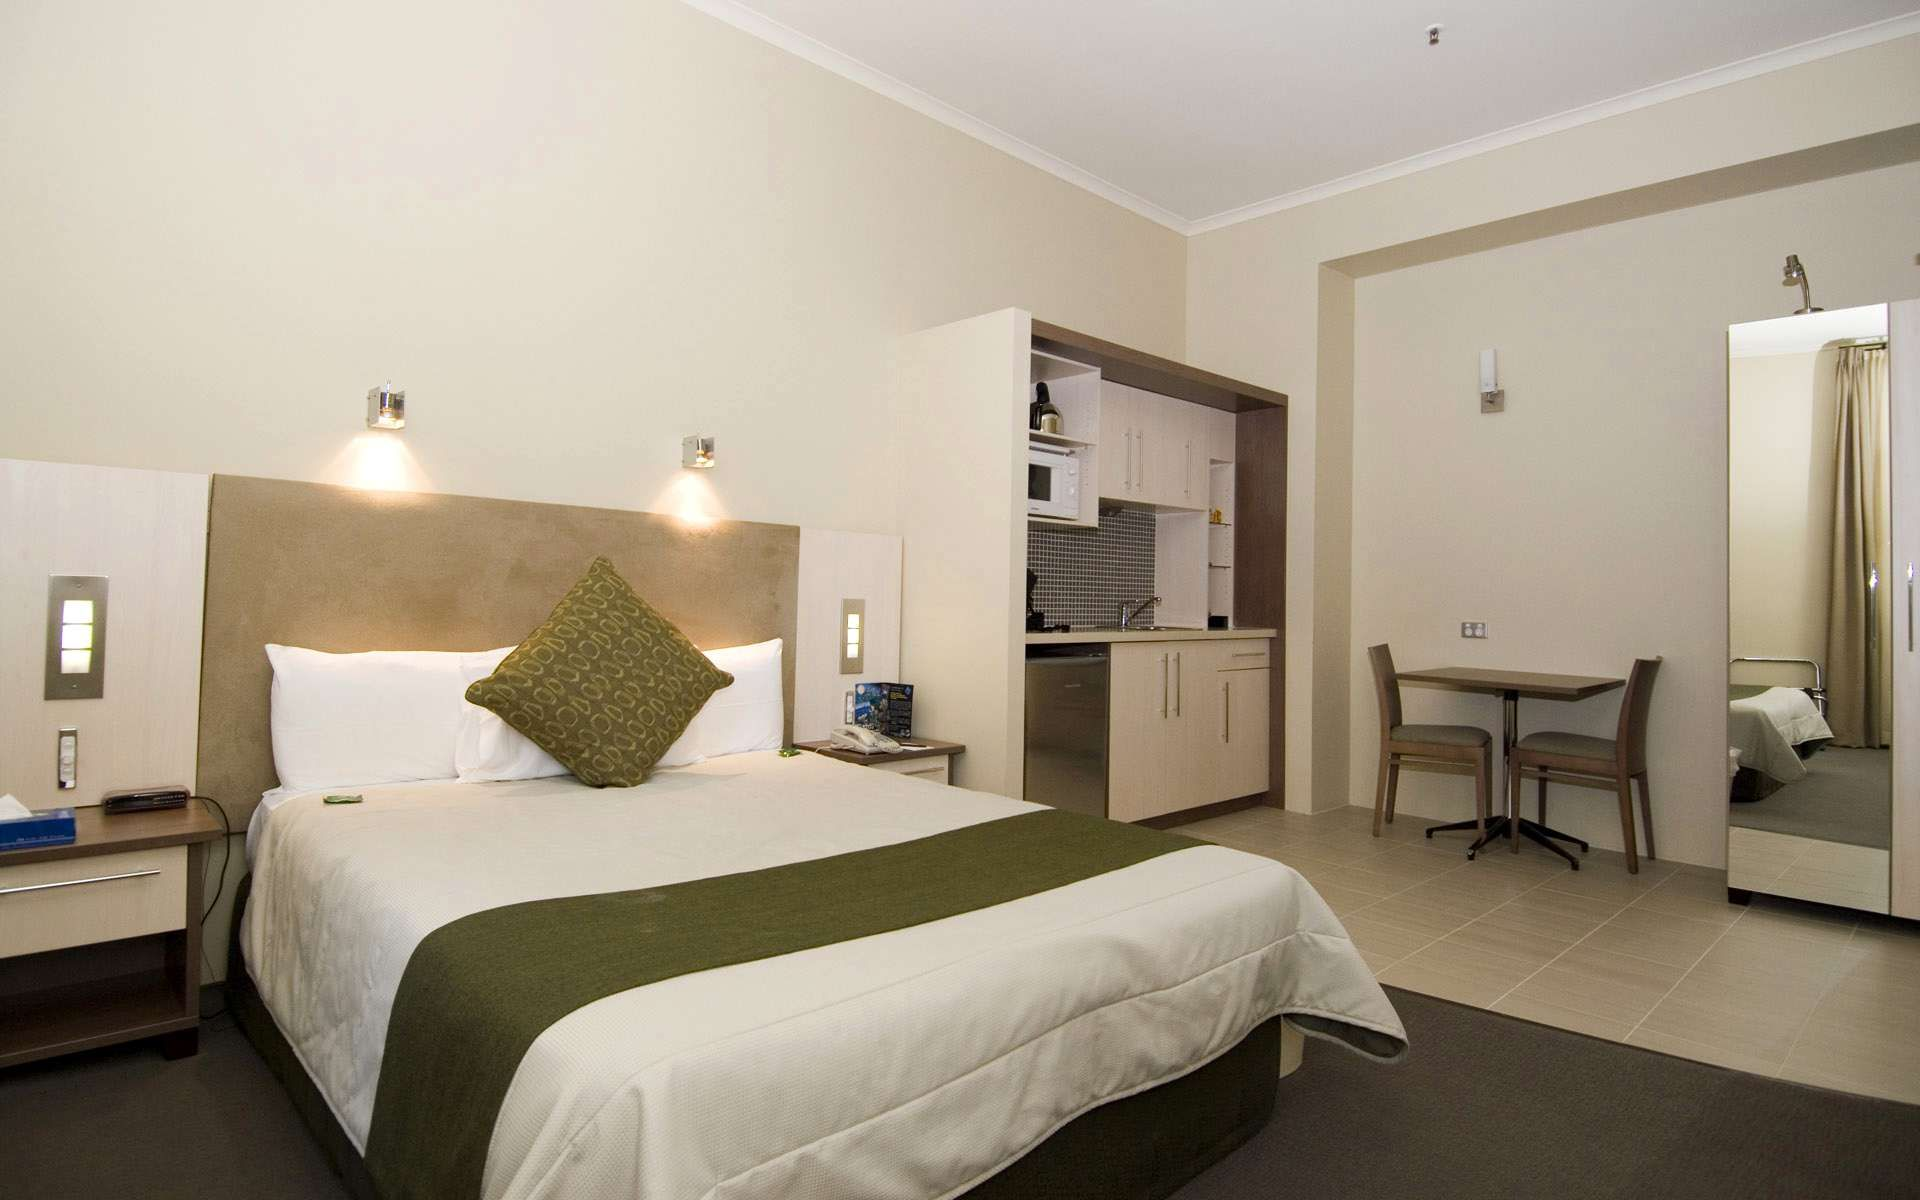 Bedroom interior hd pics click here to download in hd format ueue interior wallpaper hd